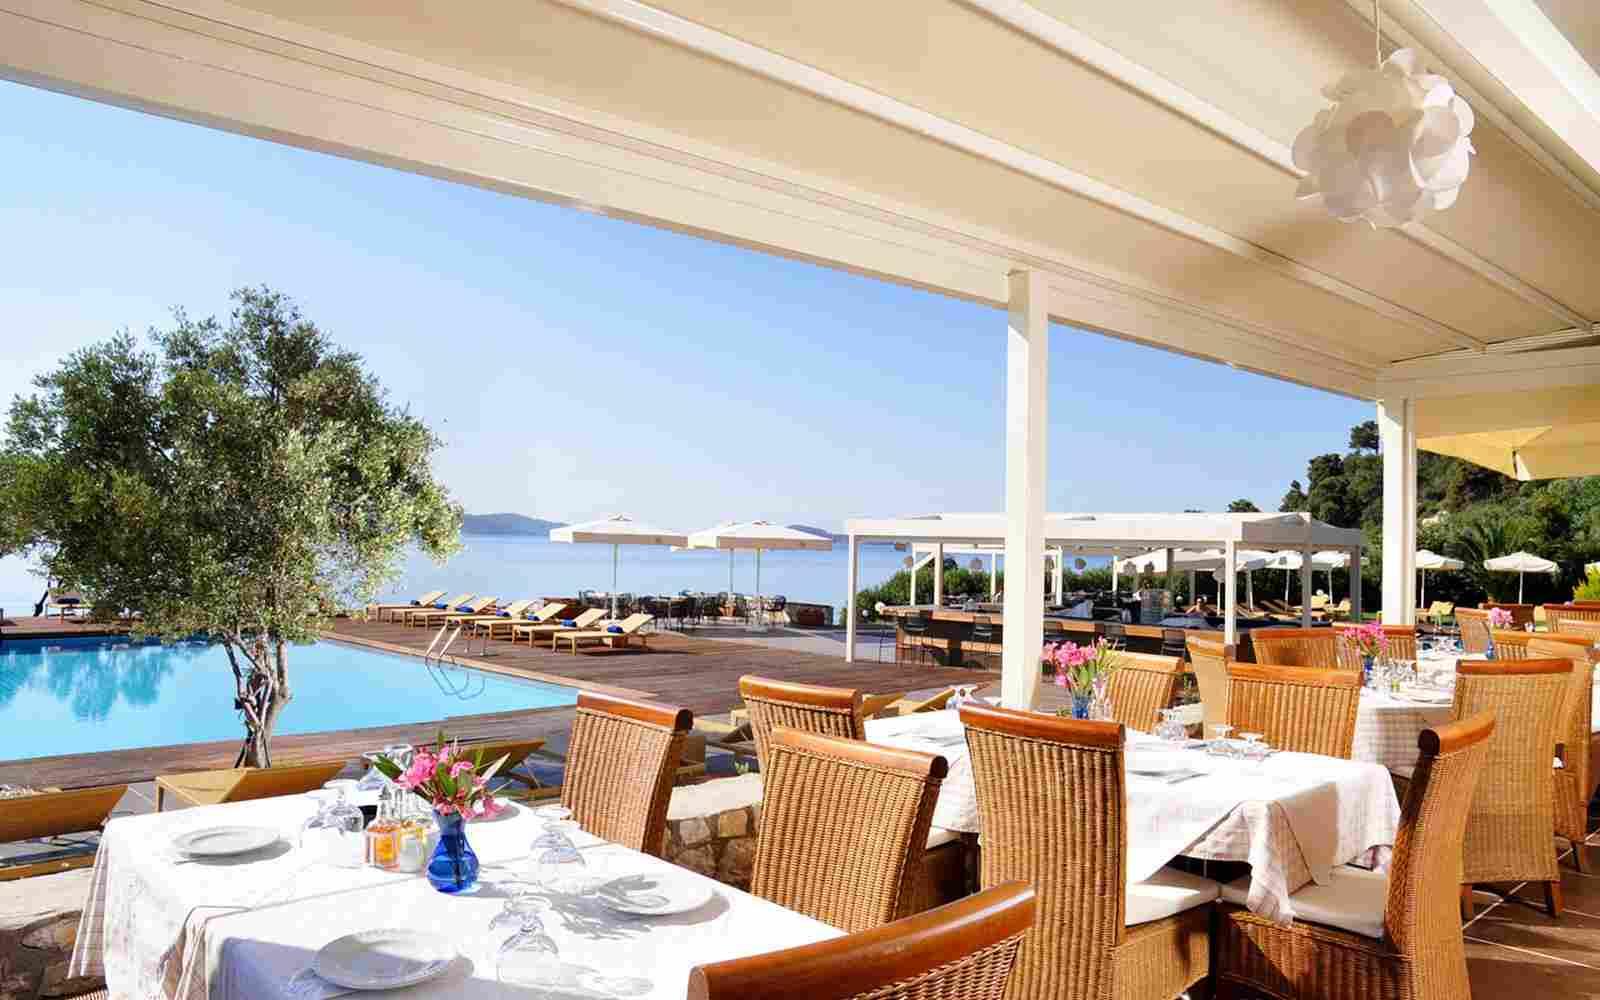 https://www.bellacosta.org/wp-content/uploads/2016/03/summer-hotel-08.jpg